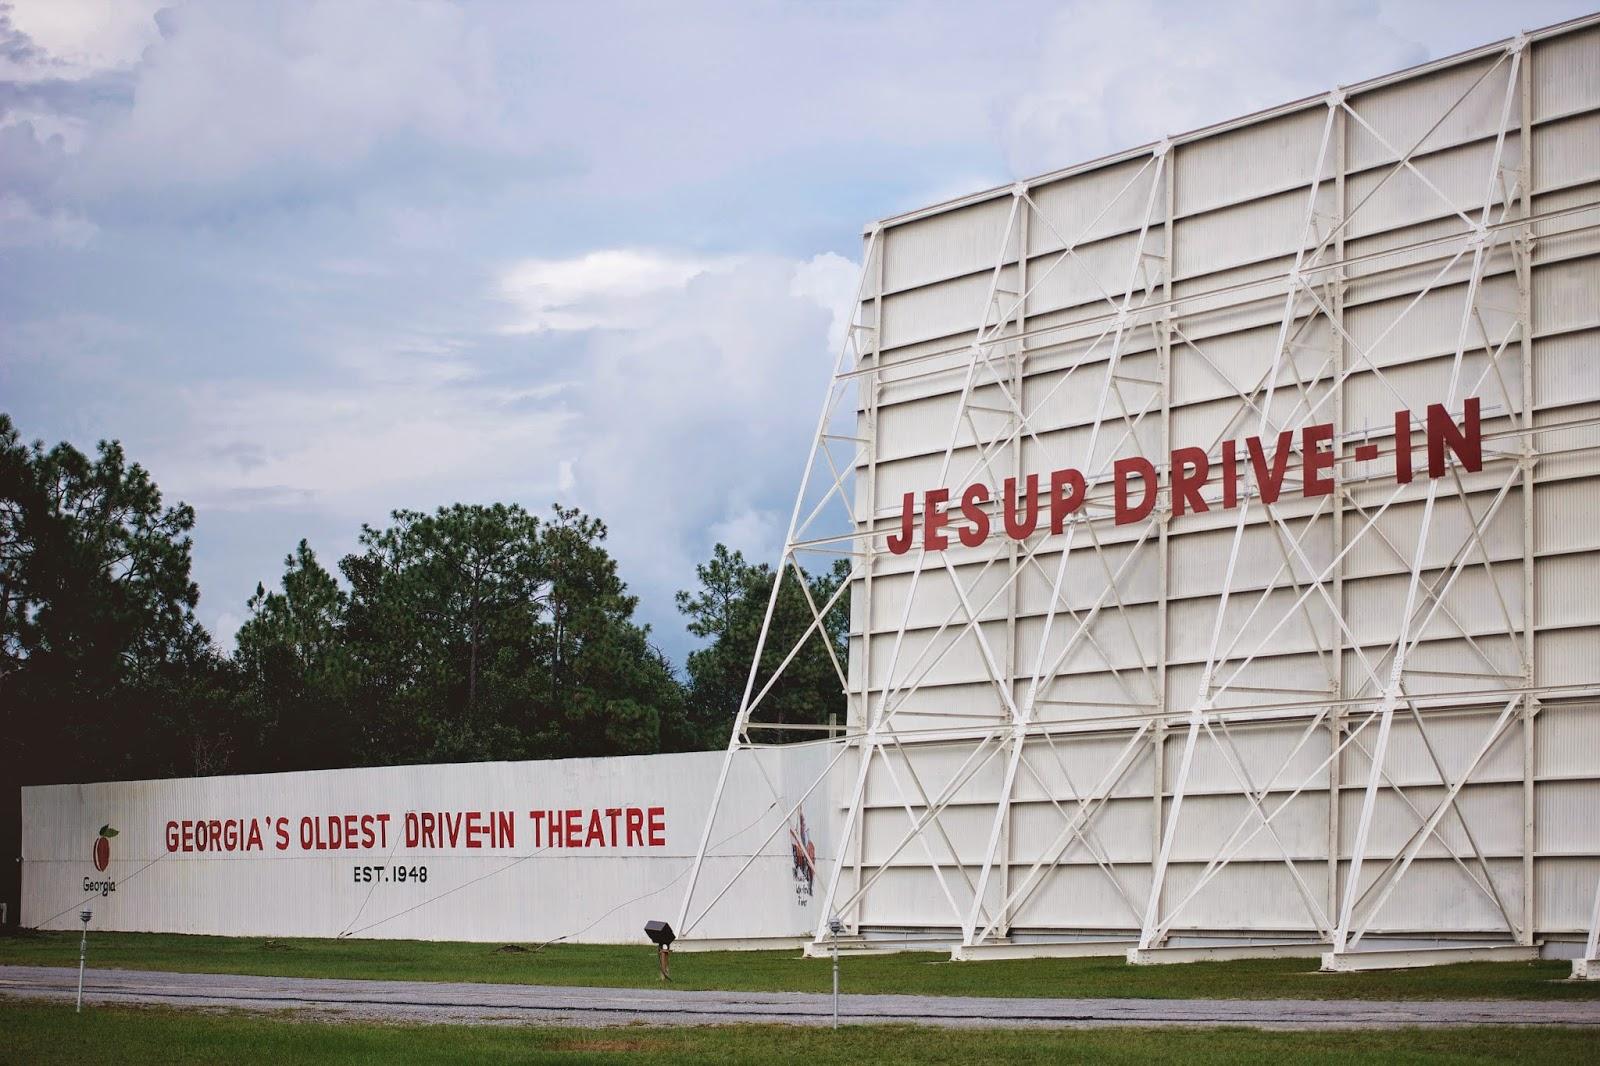 Jesup Drive In Theatre Jesup Ga